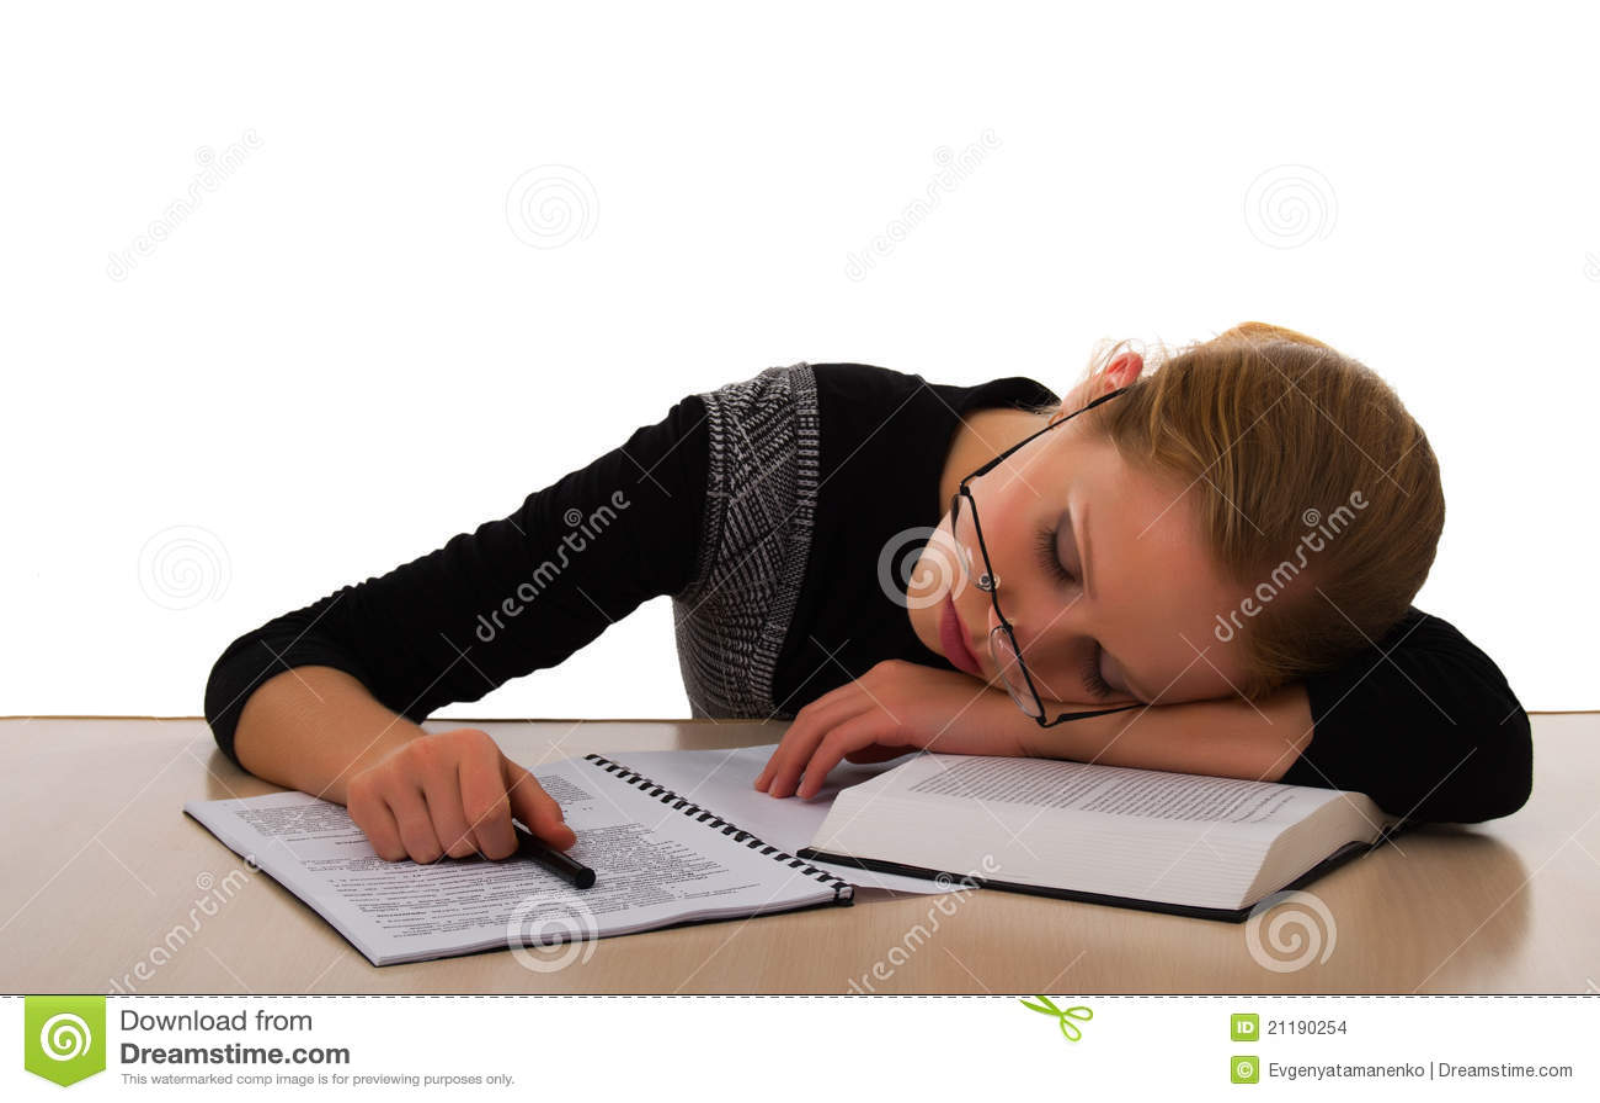 Estudante Tired